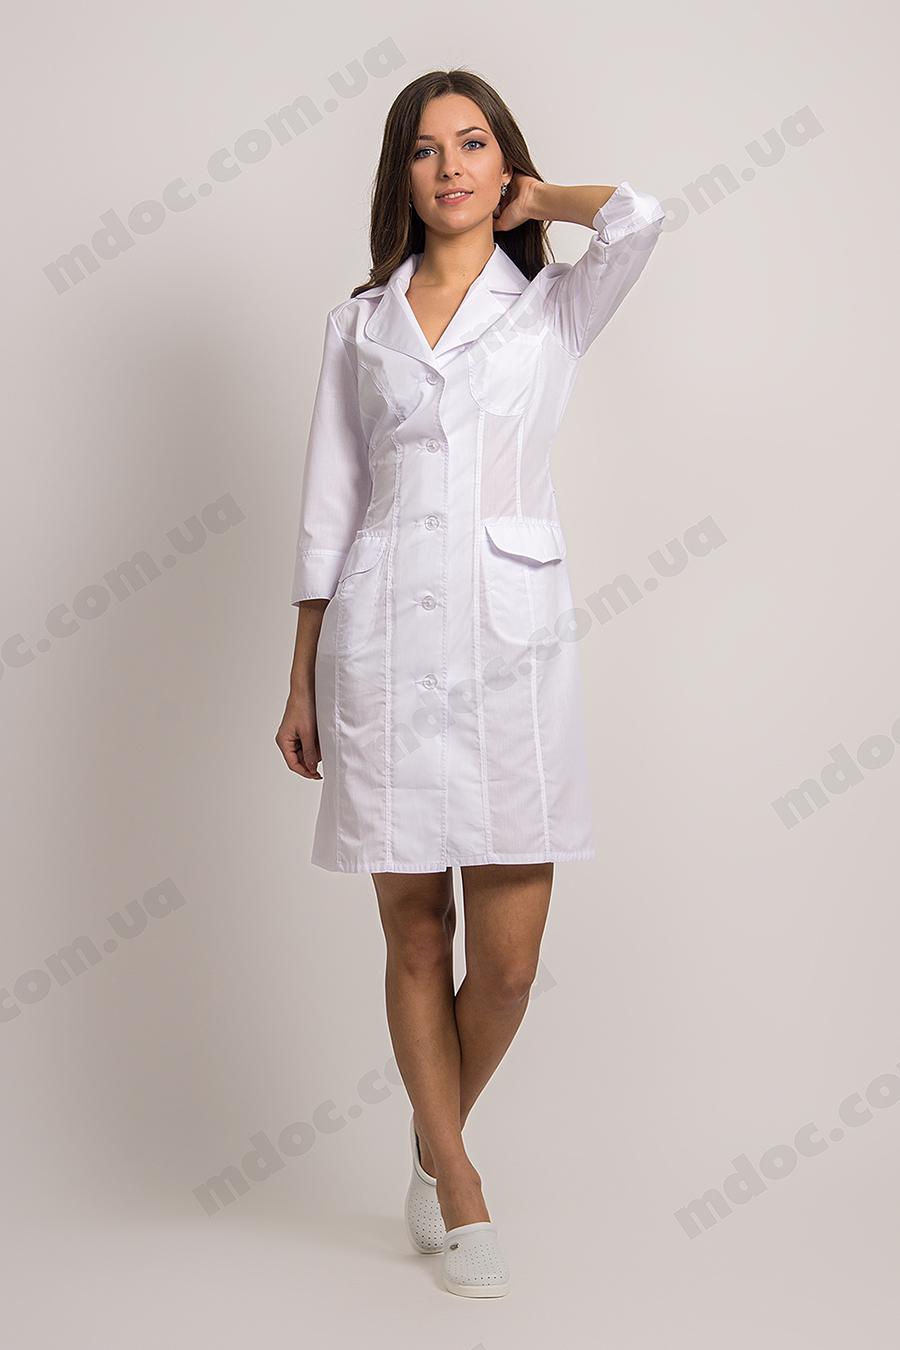 медицинский халат белый фото